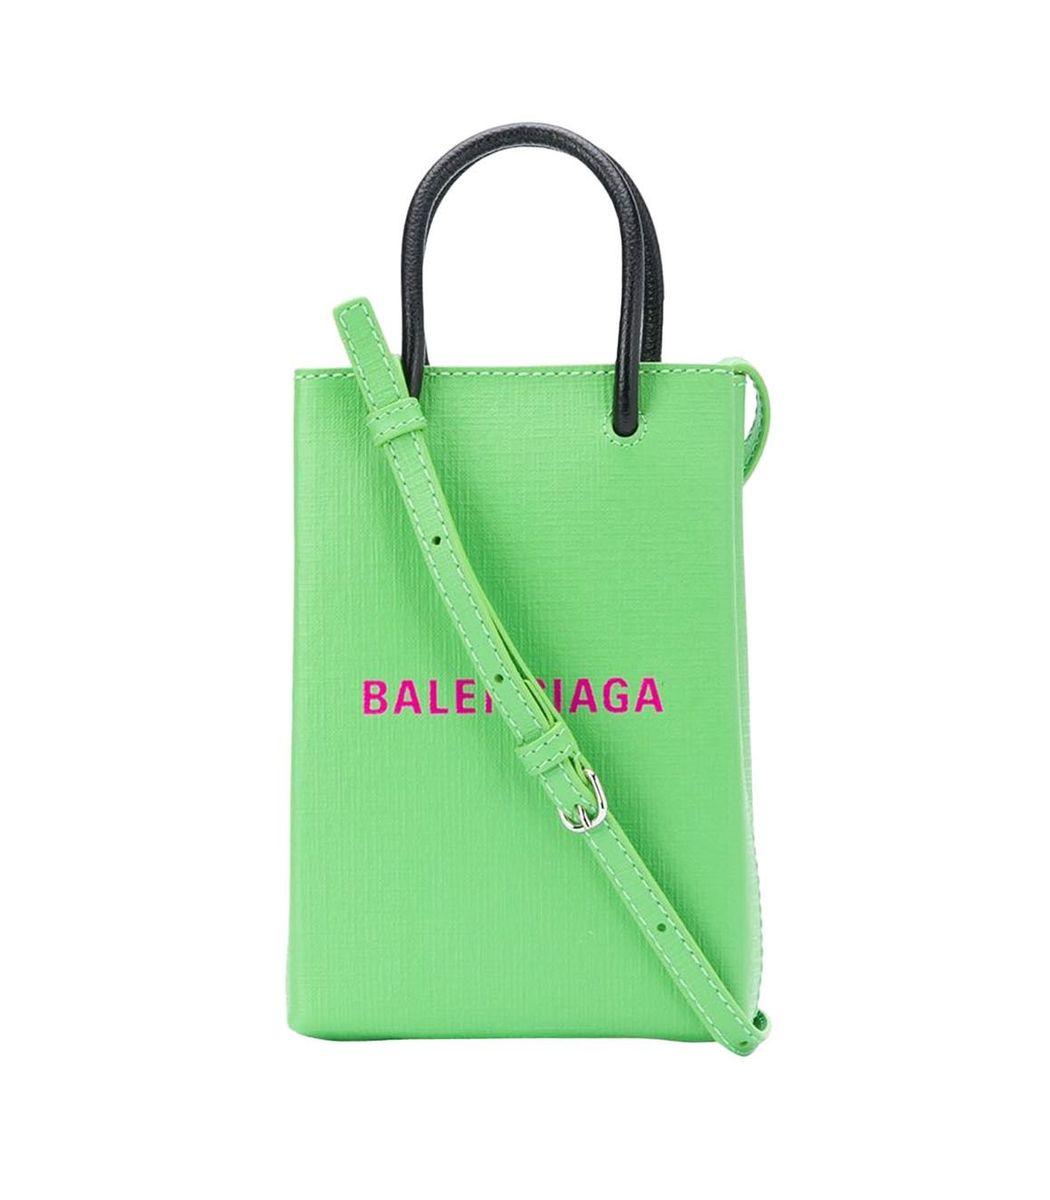 Balenciaga Phone Crossbody Handbag